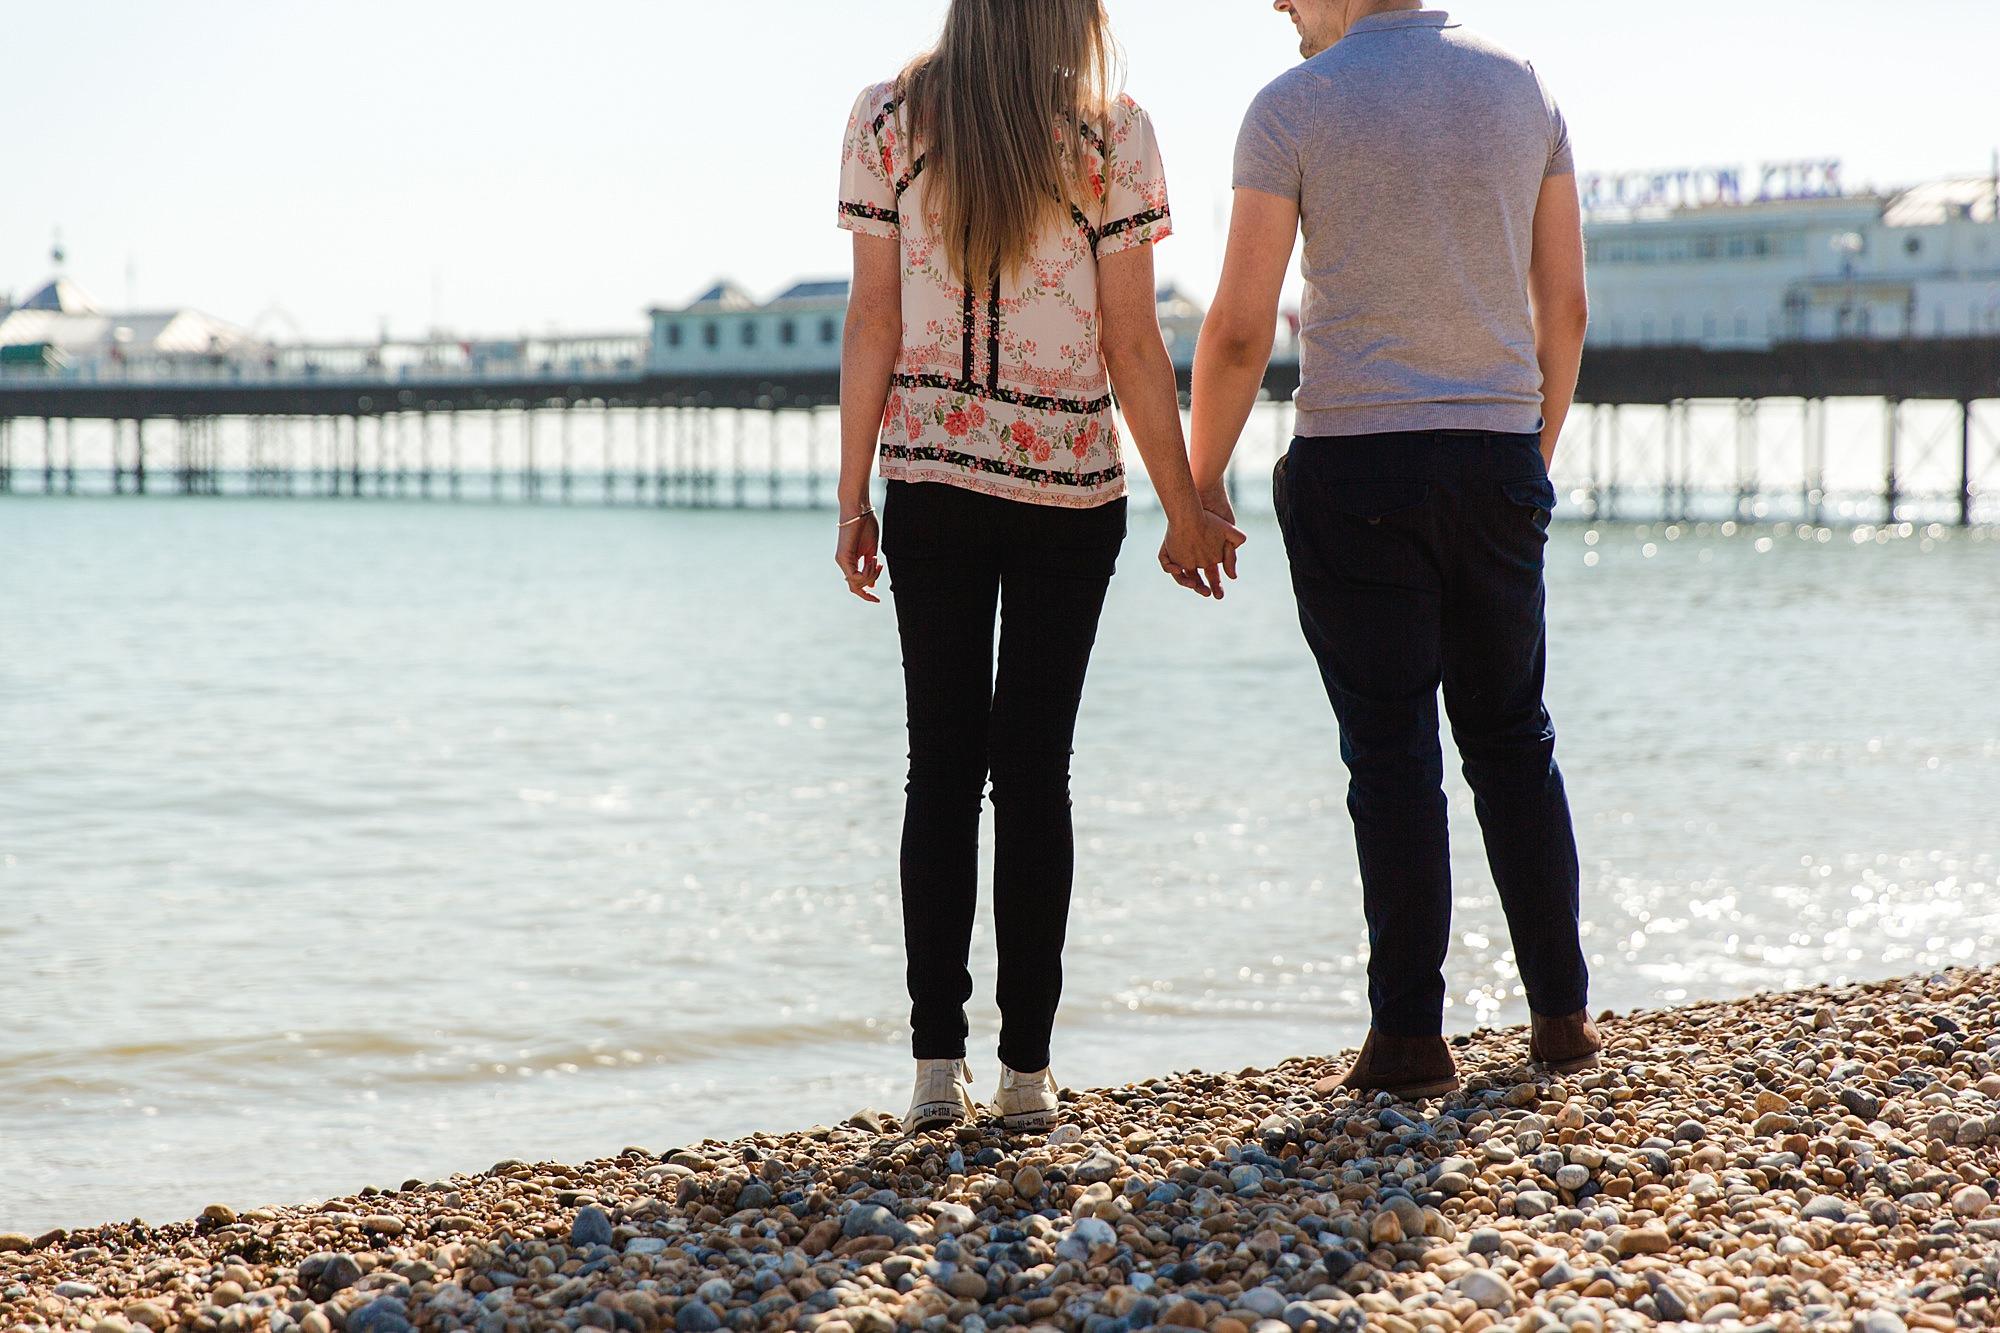 Fun Brighton engagement shoot brighton couple standing on beach